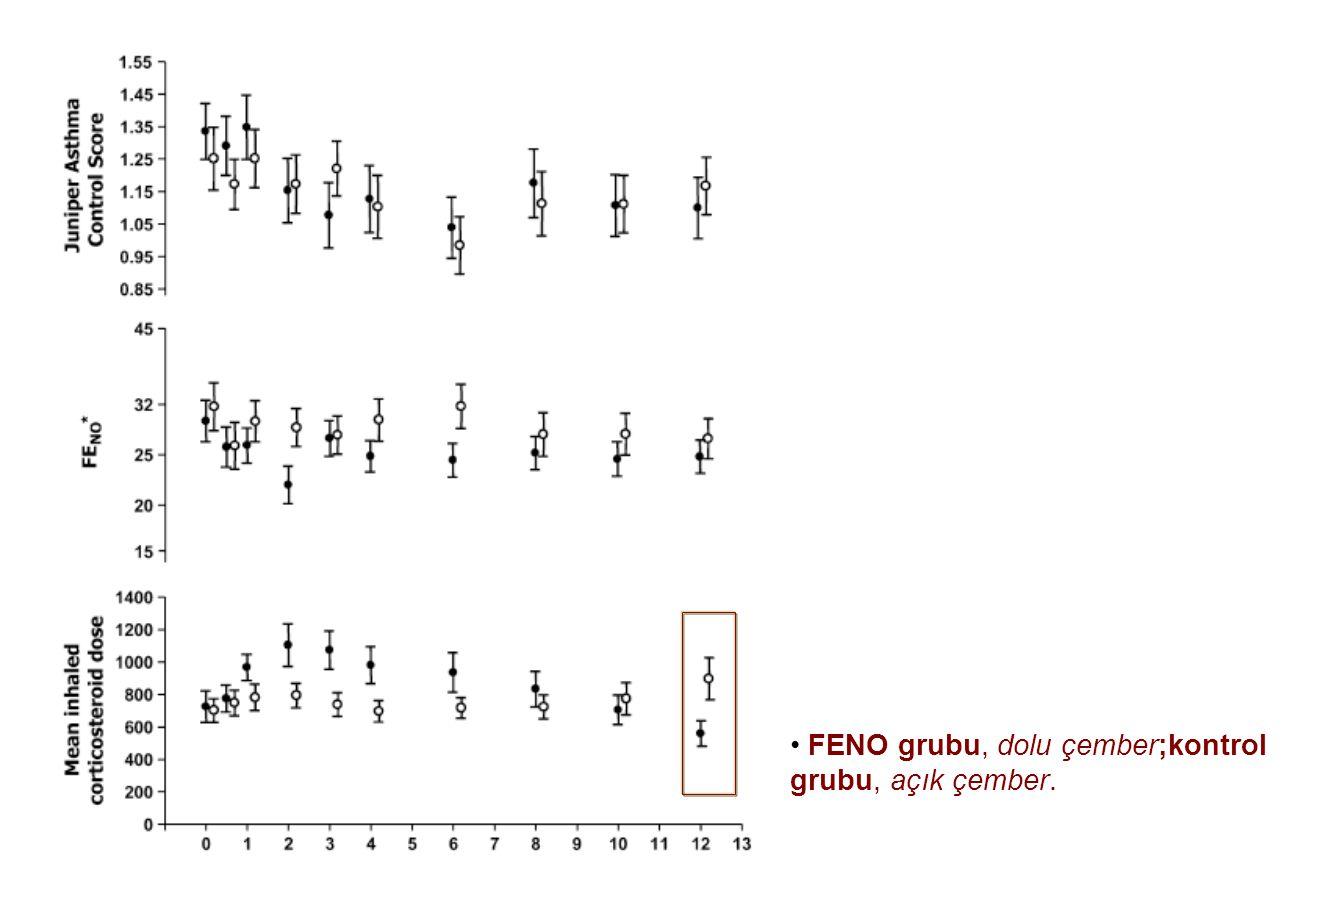 FENO grubu, dolu çember;kontrol grubu, açık çember.